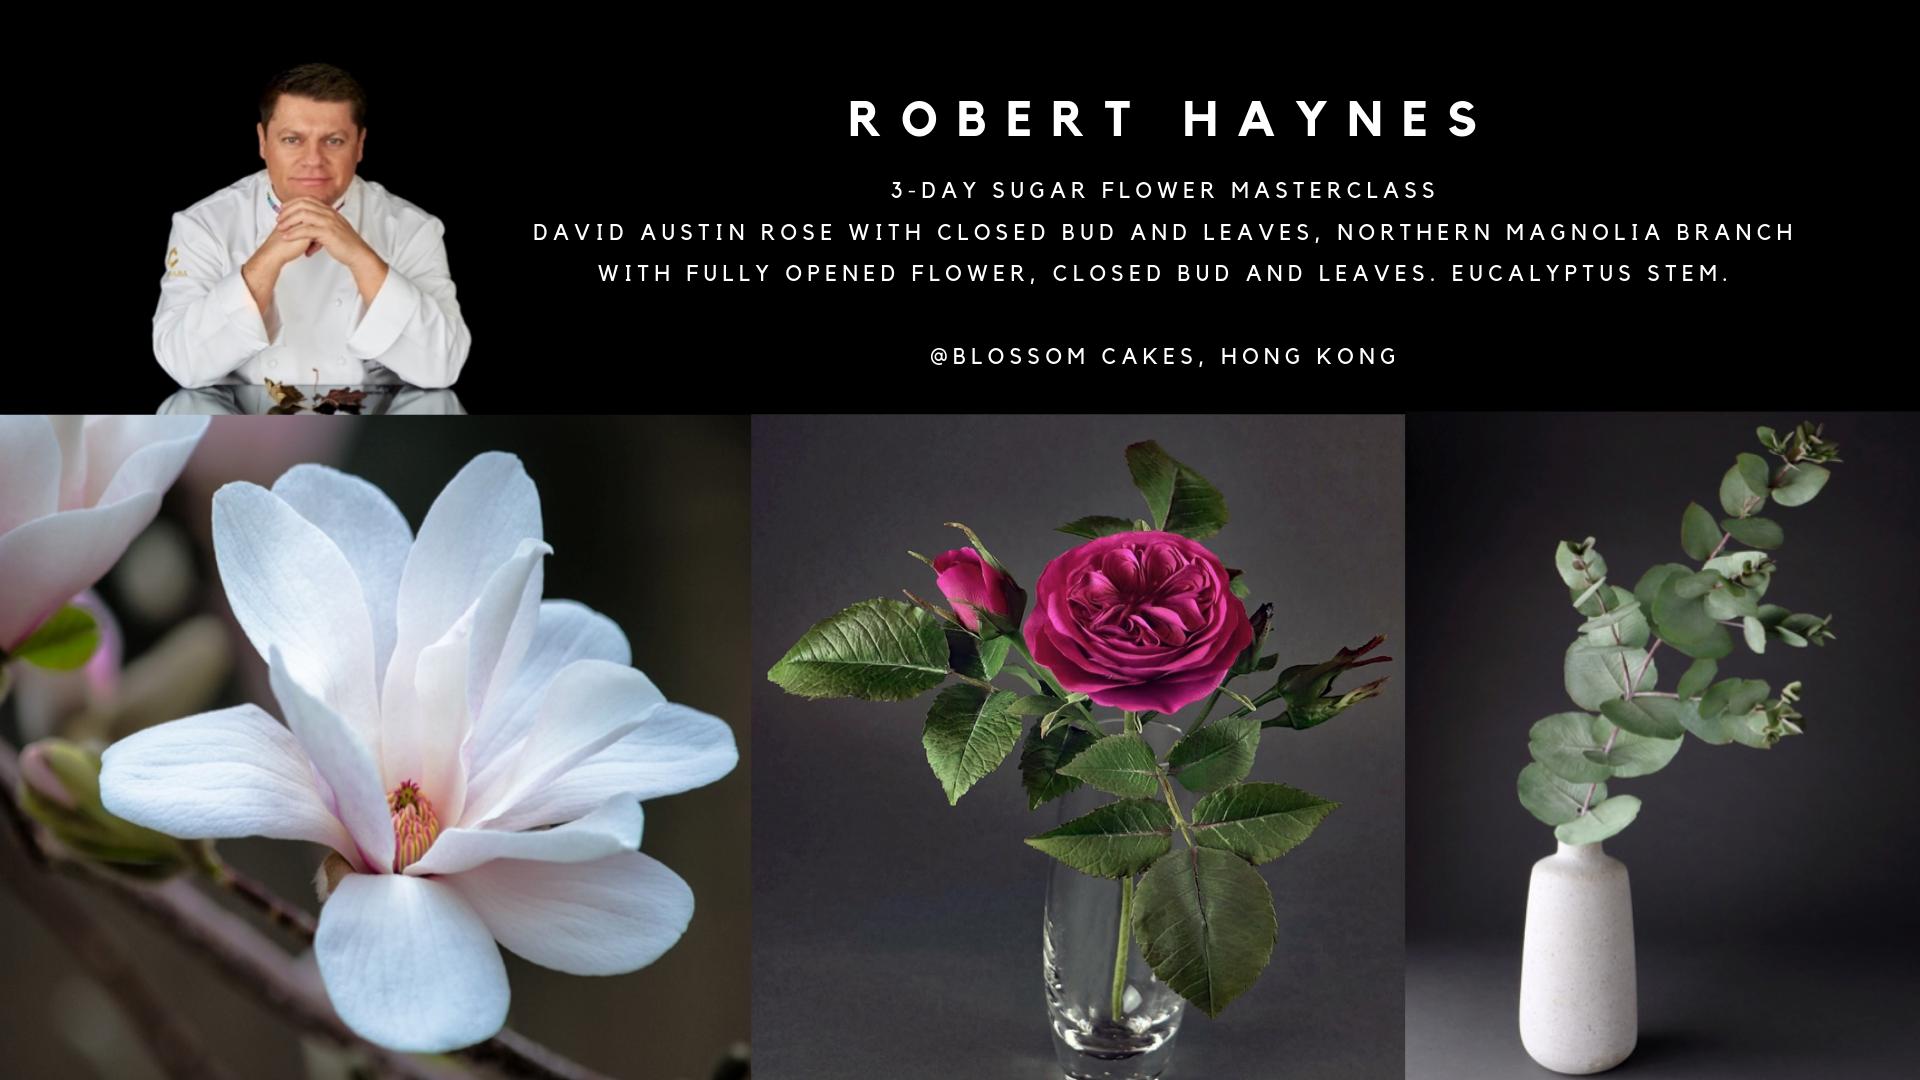 Robert Haynes Masterclass